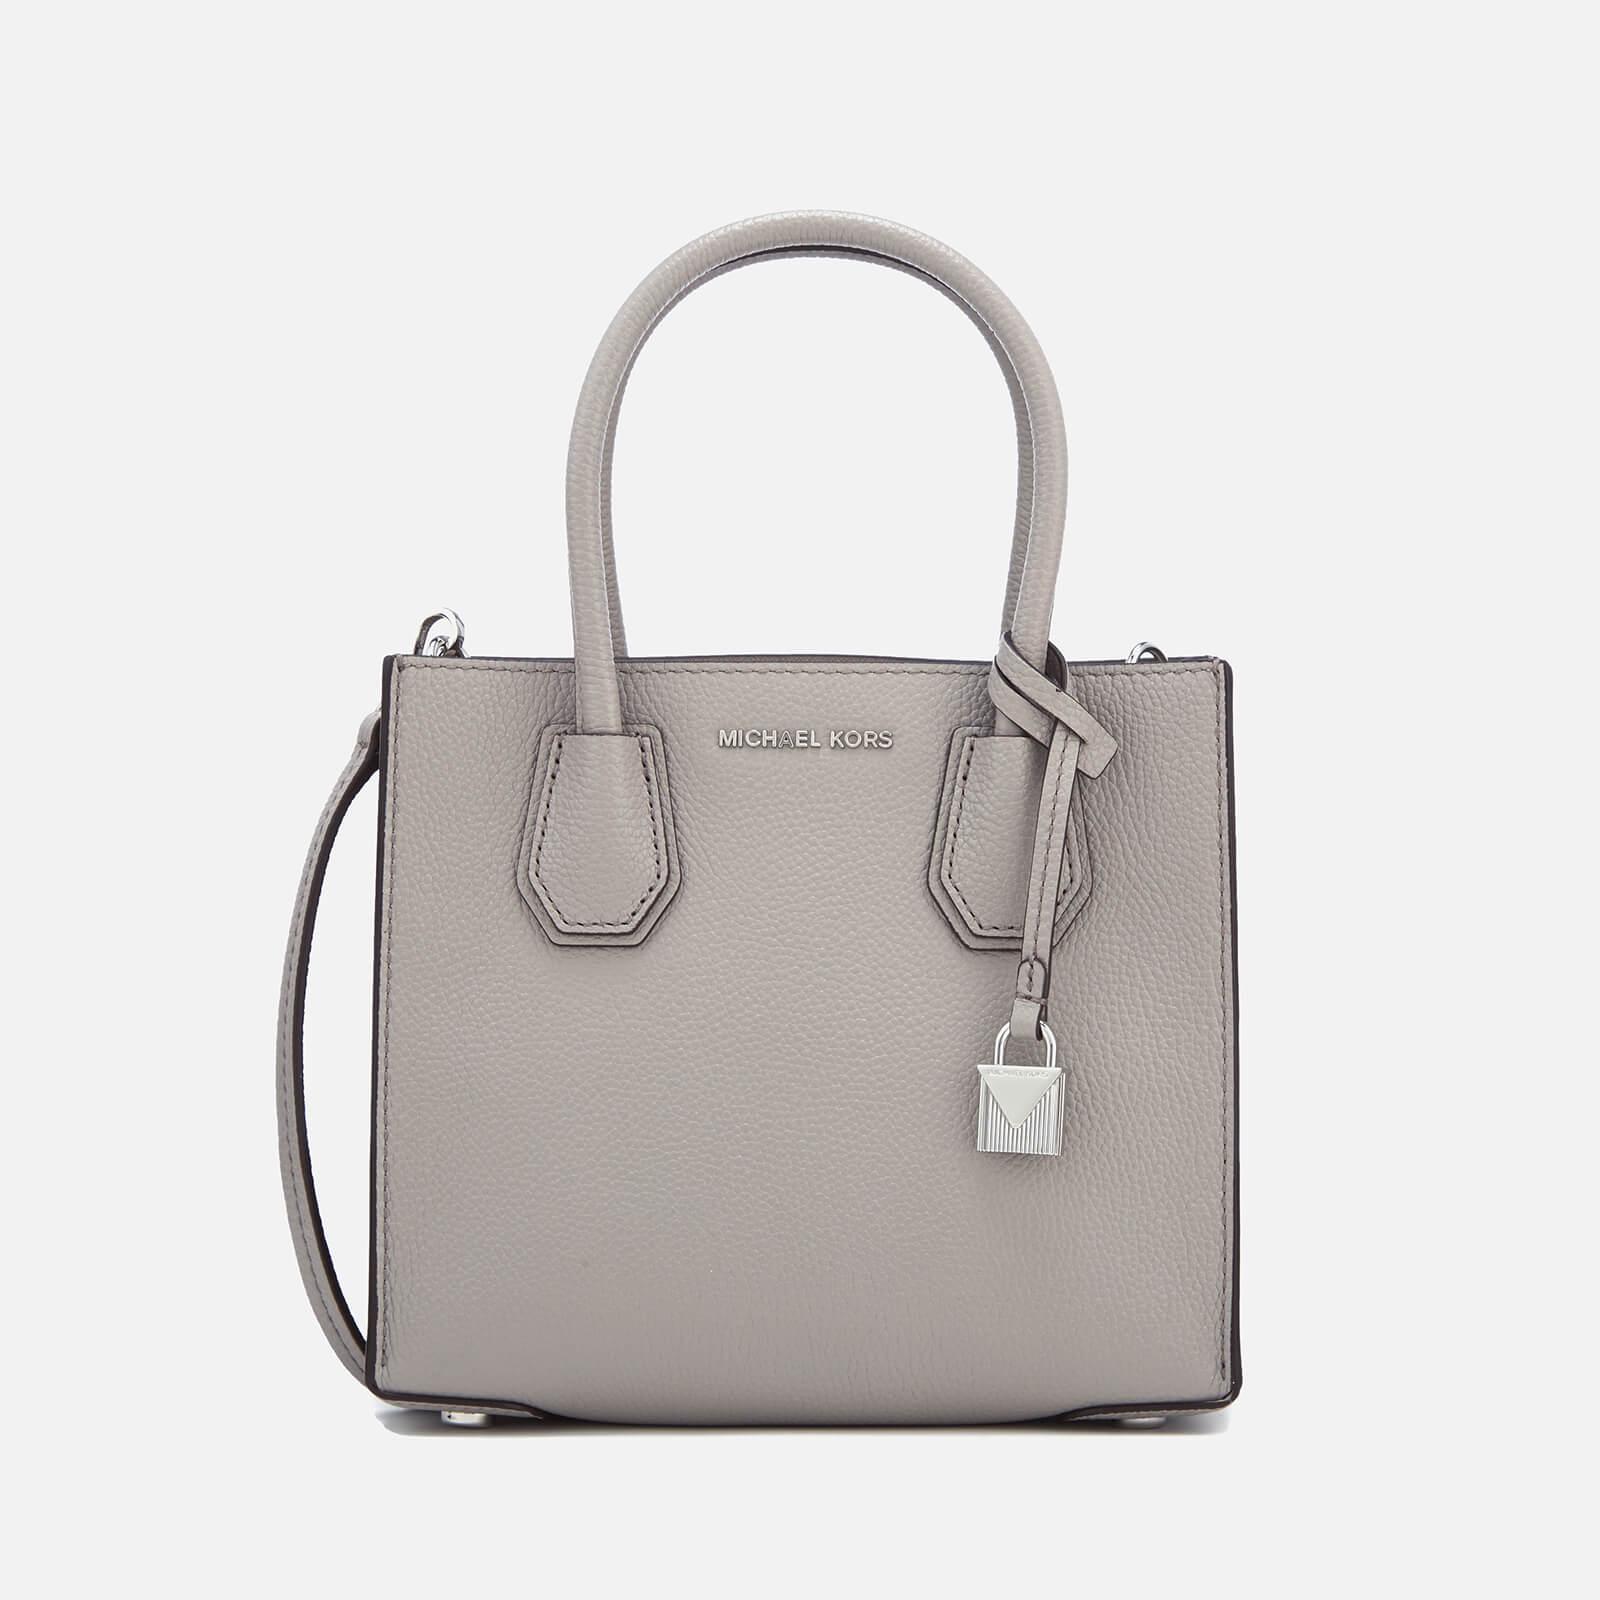 052aa15be485 MICHAEL MICHAEL KORS Women's Mercer Medium Tote Bag - Pearl Grey - Free UK  Delivery over £50